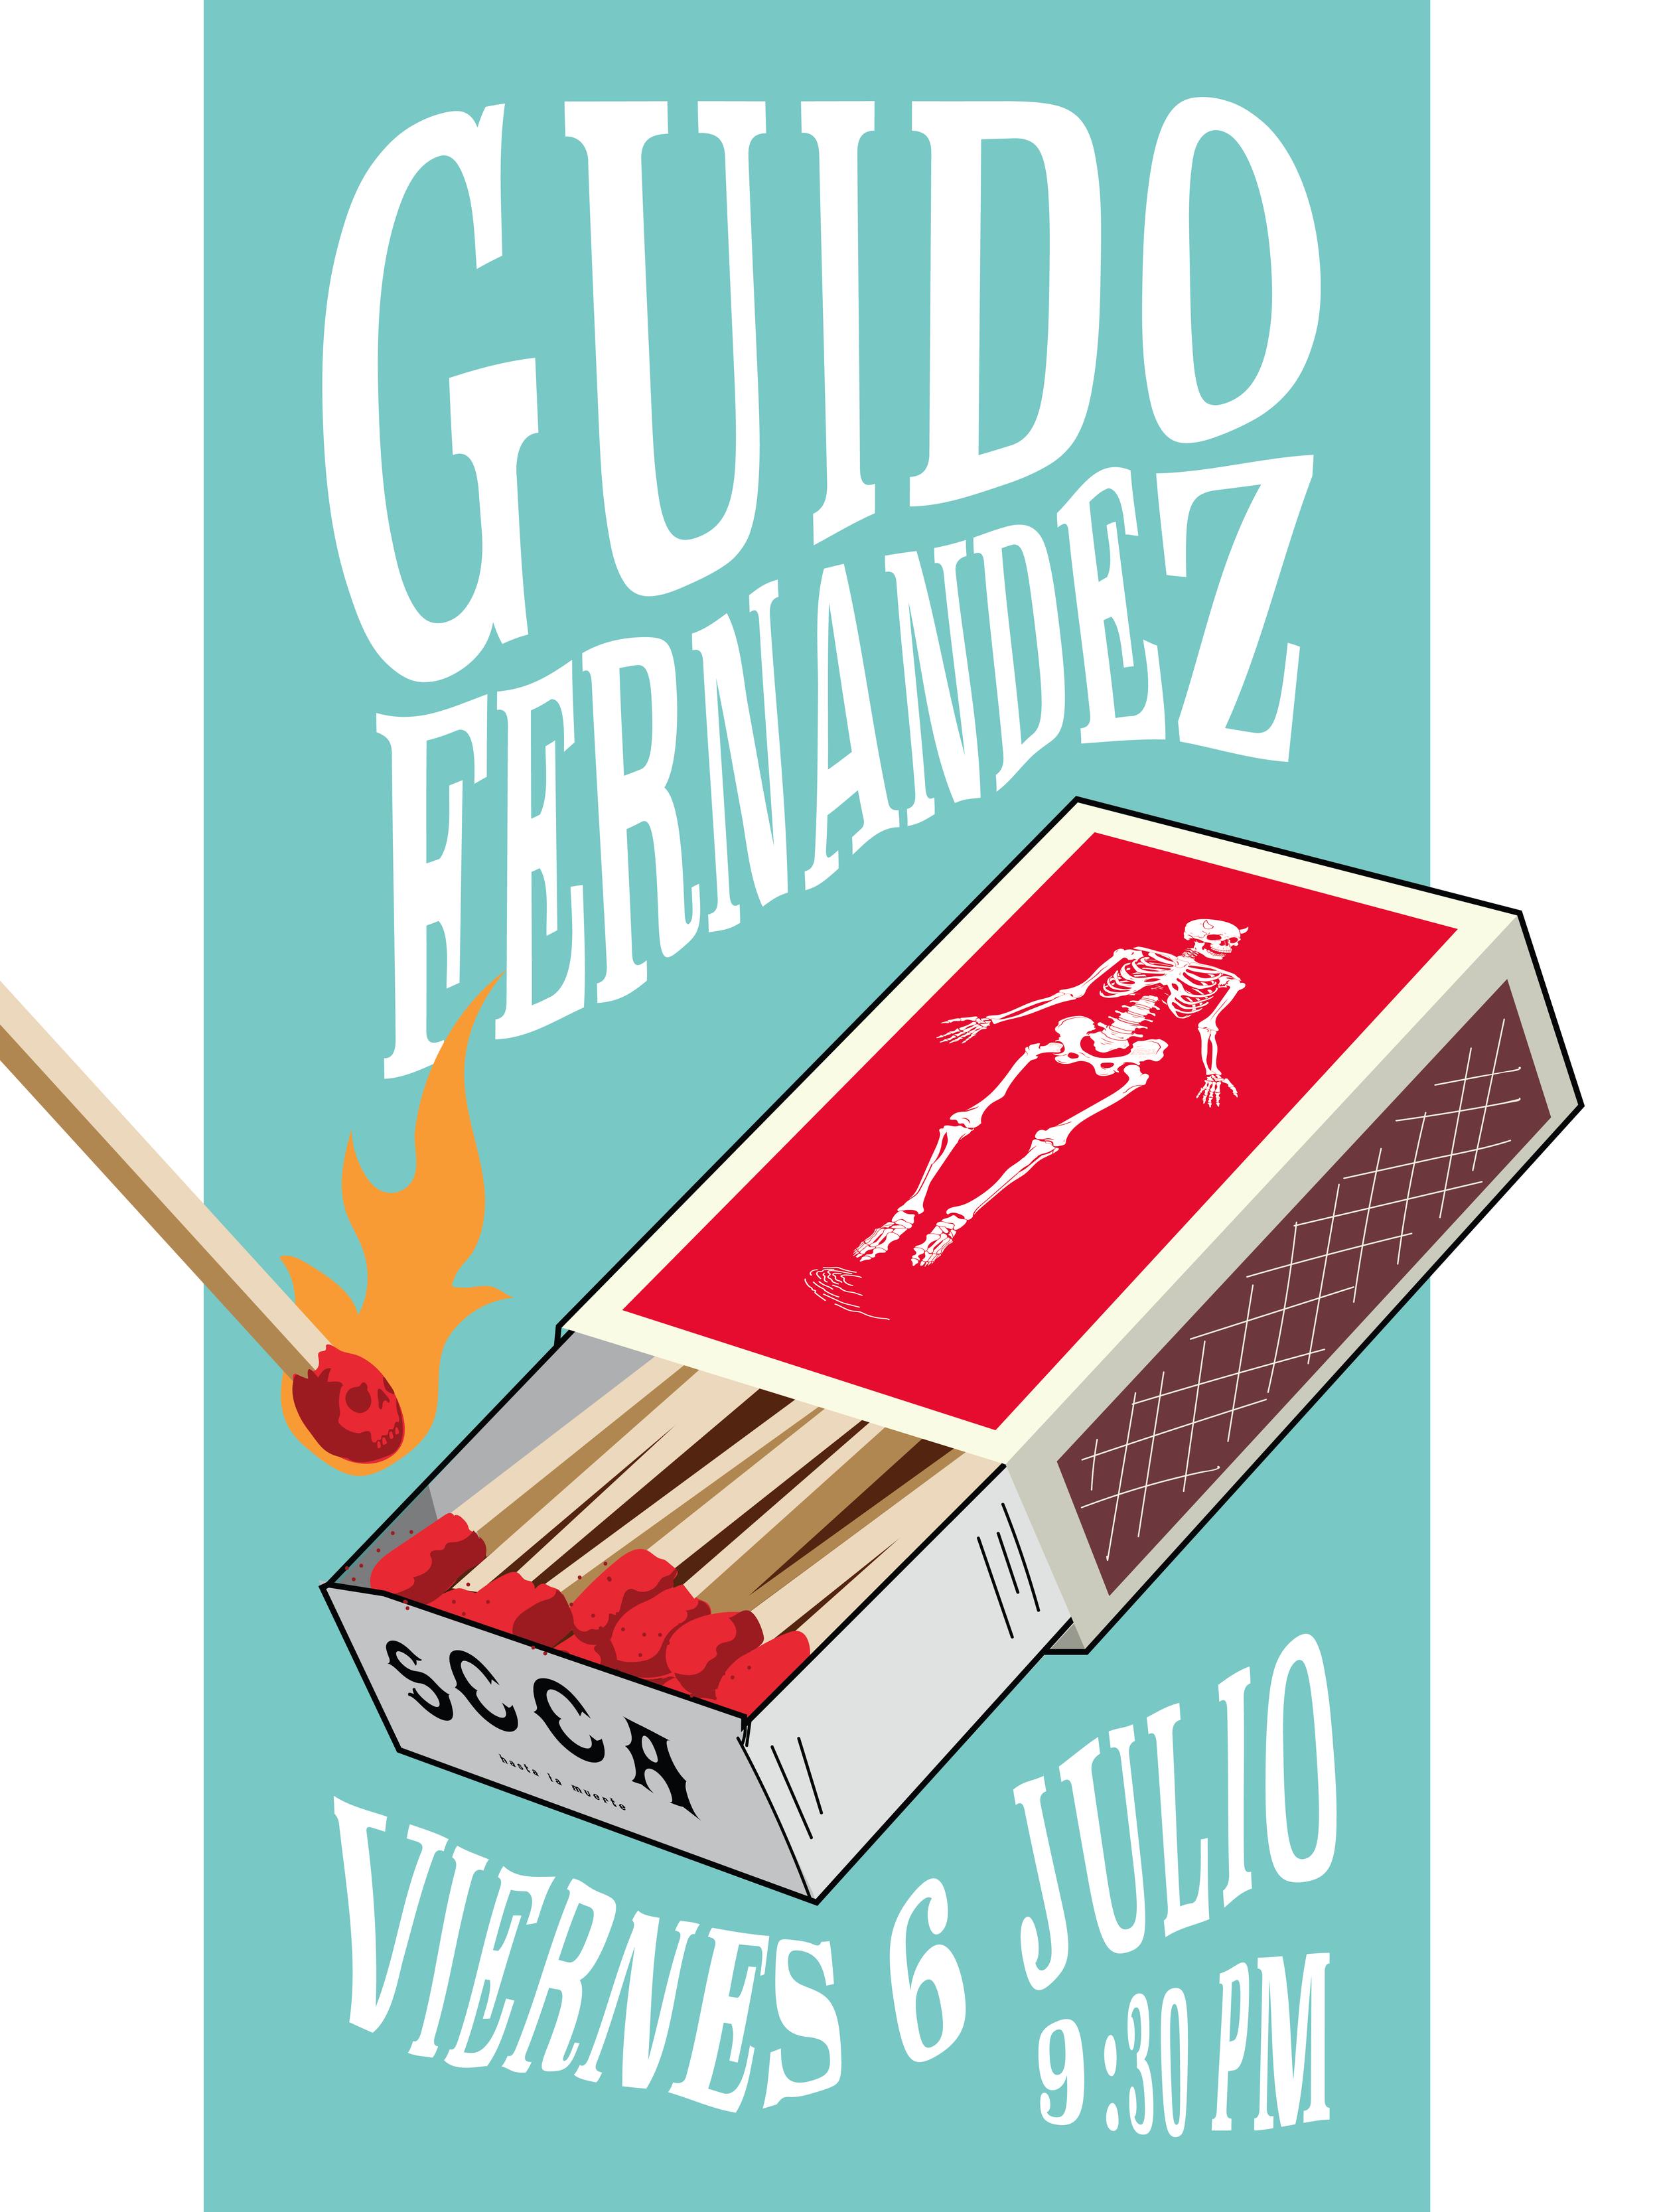 guidofernandez-01.png